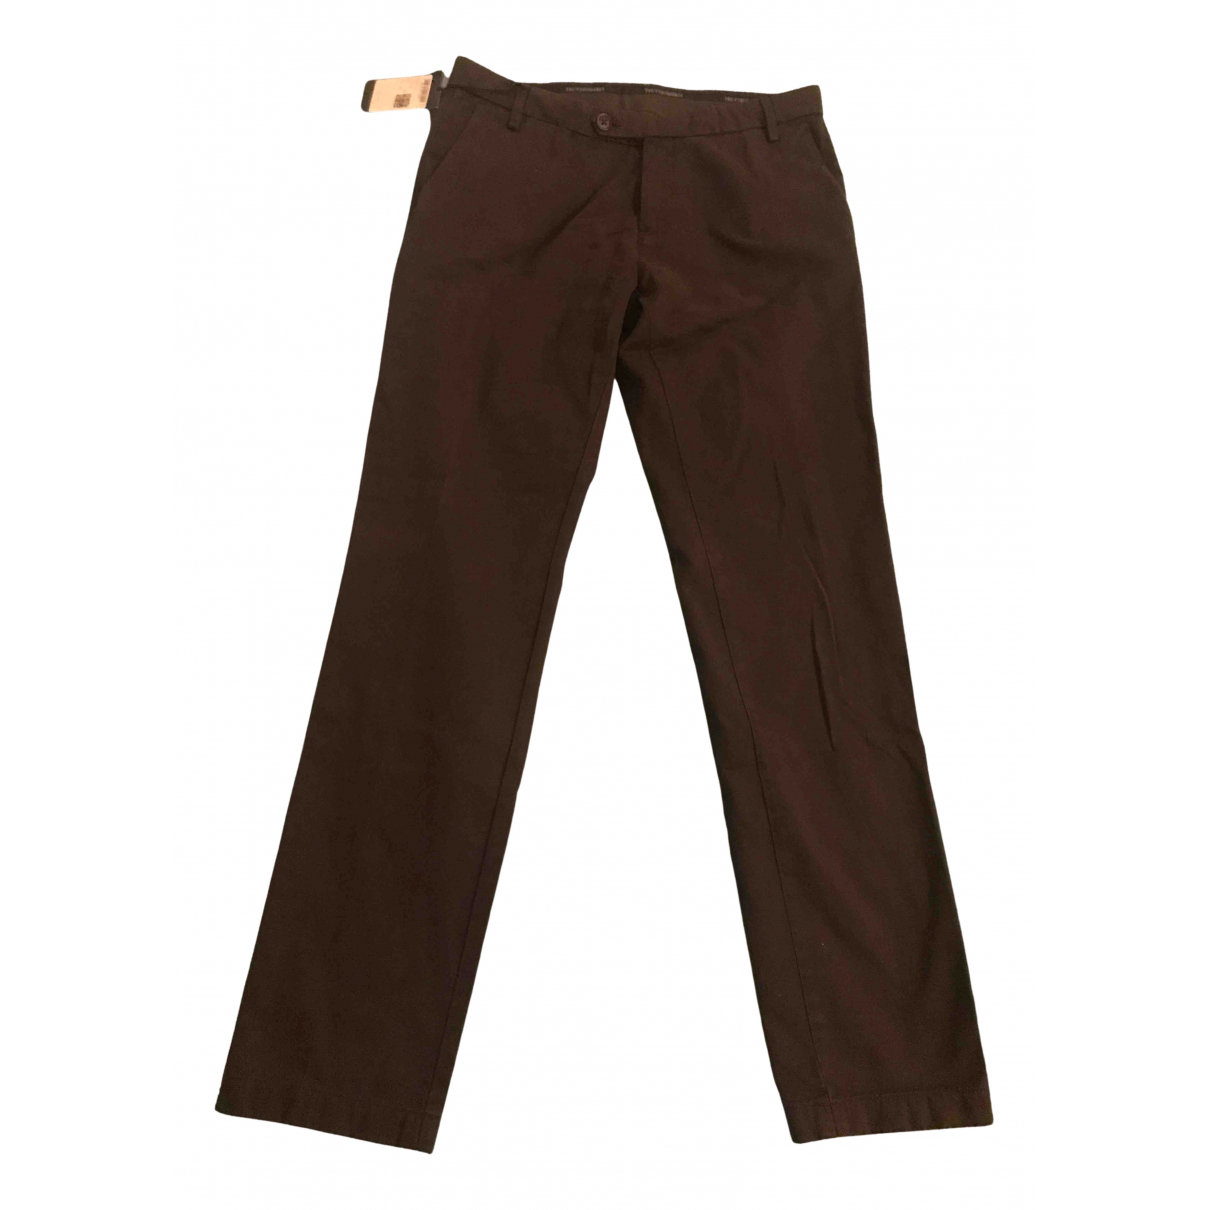 Trussardi N Brown Cotton Trousers for Men 48 IT